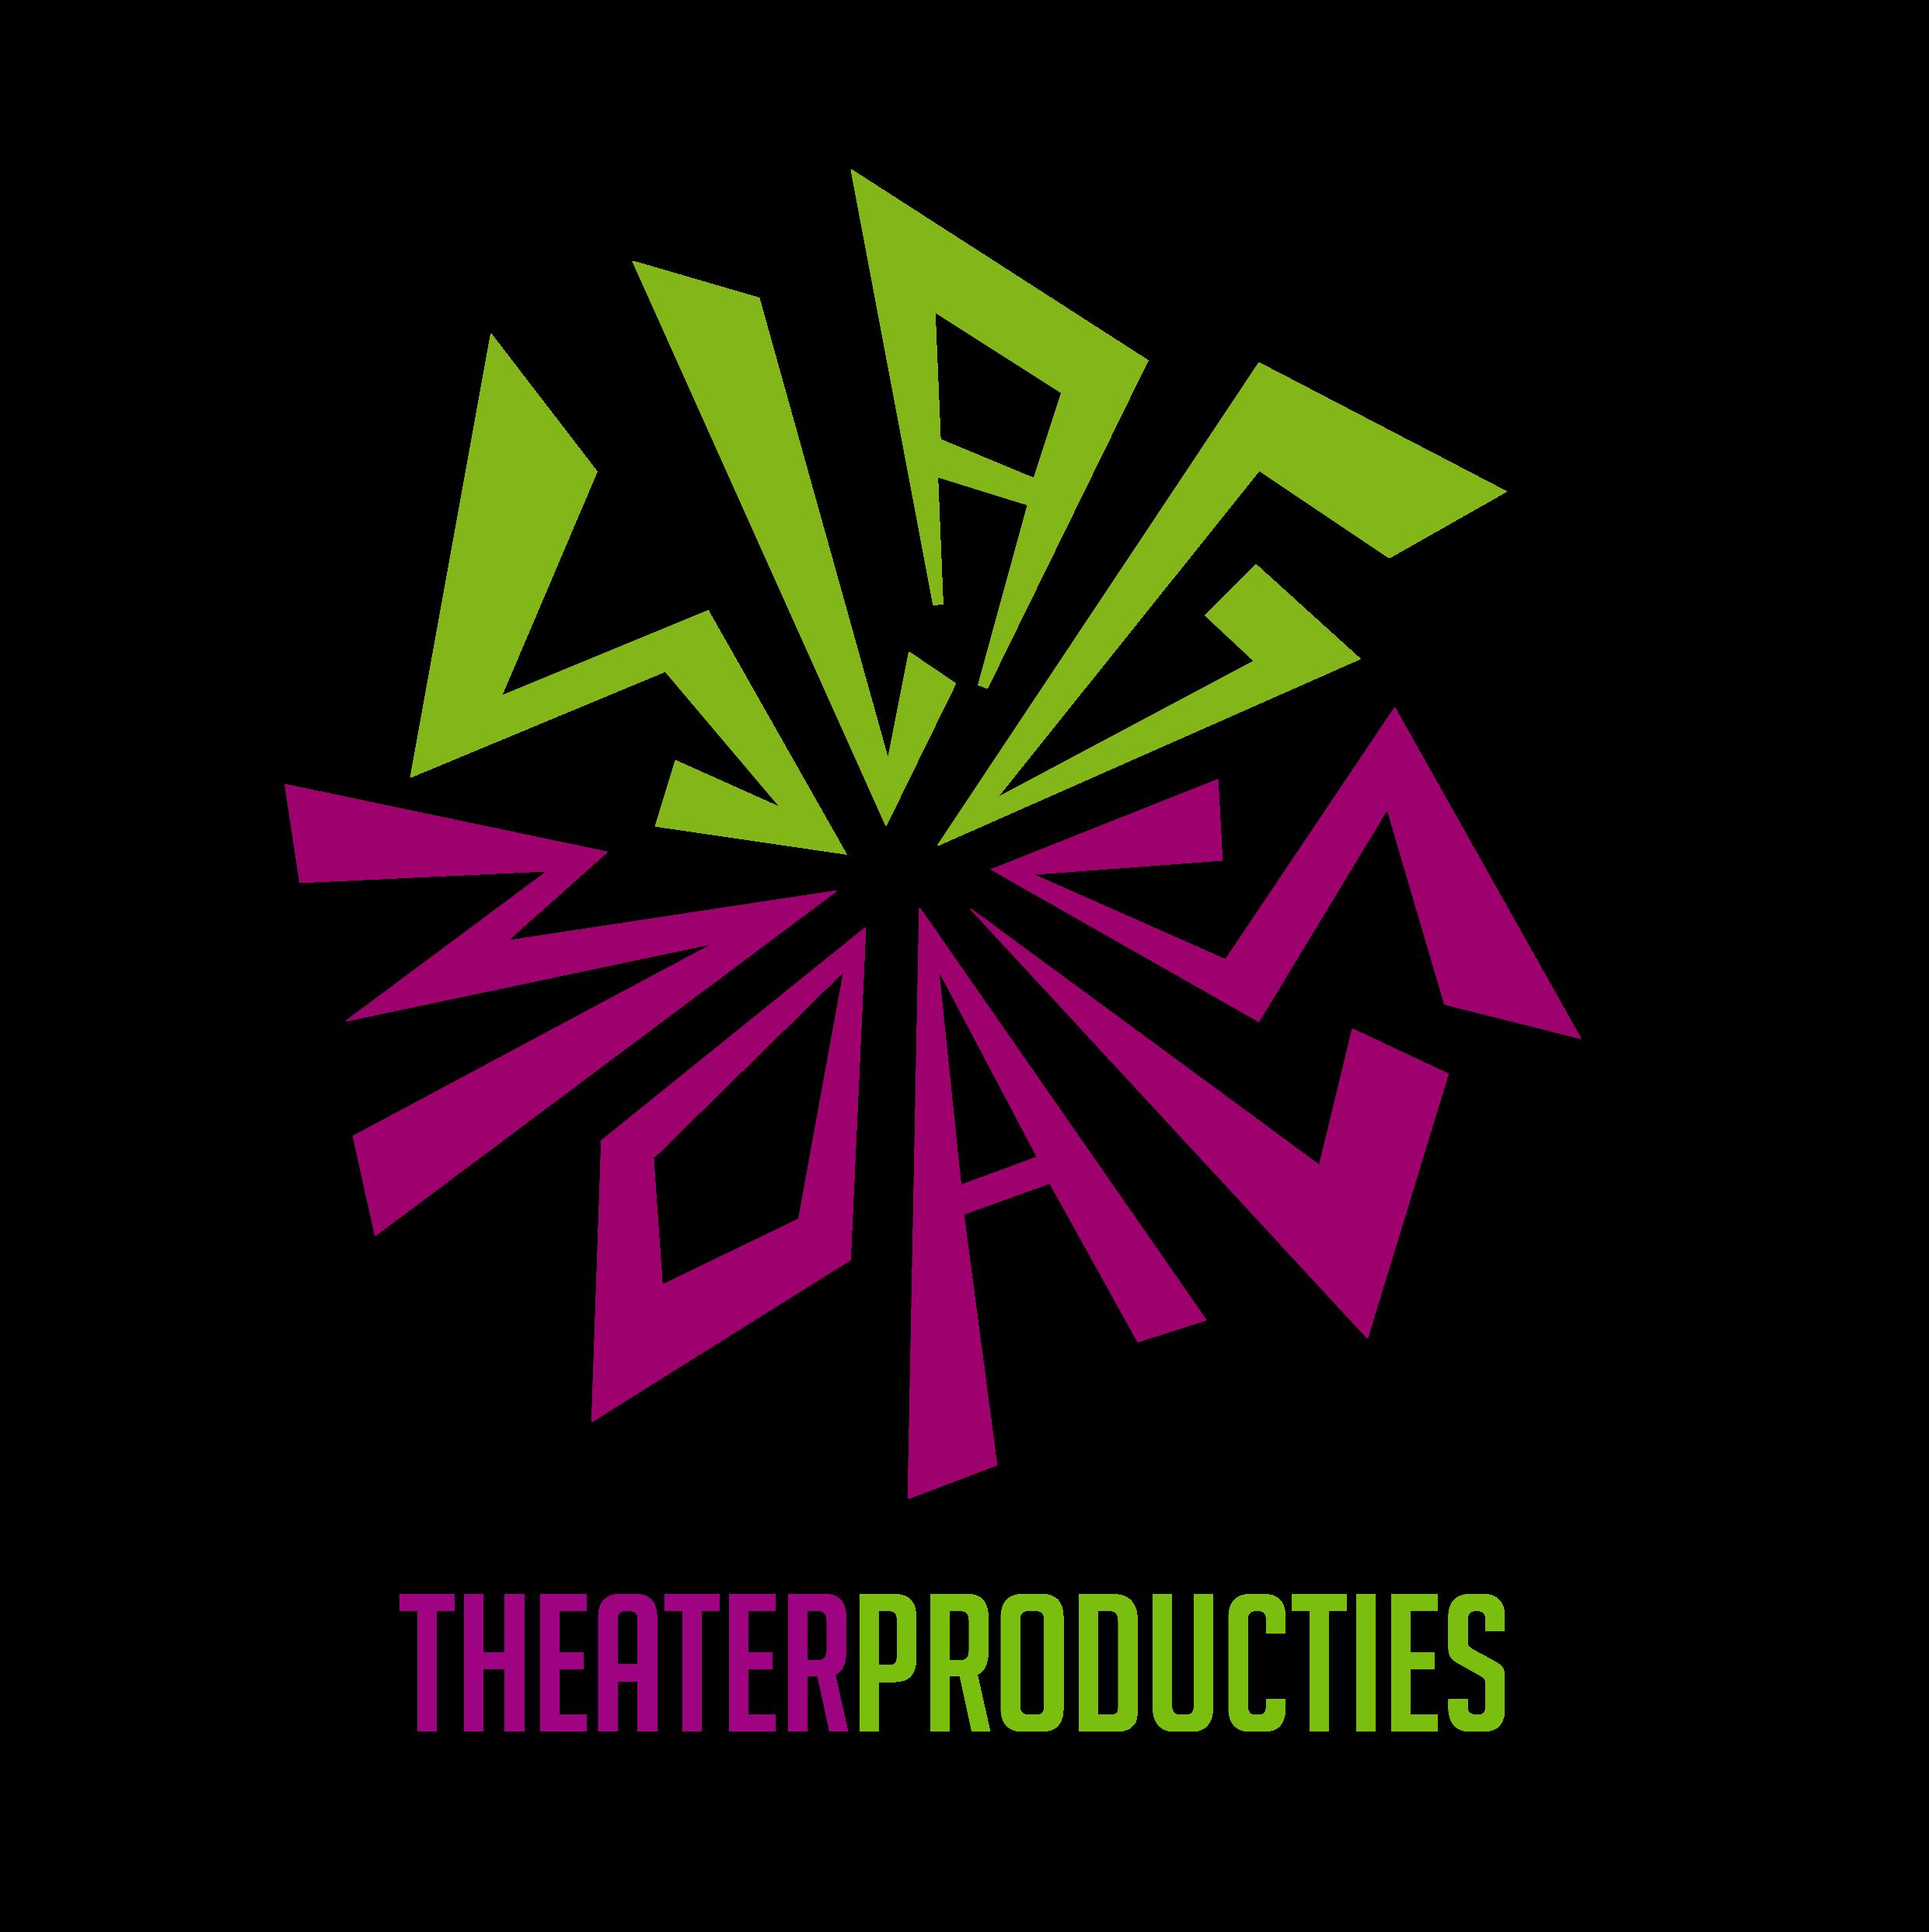 Slagmoals Theaterproducties